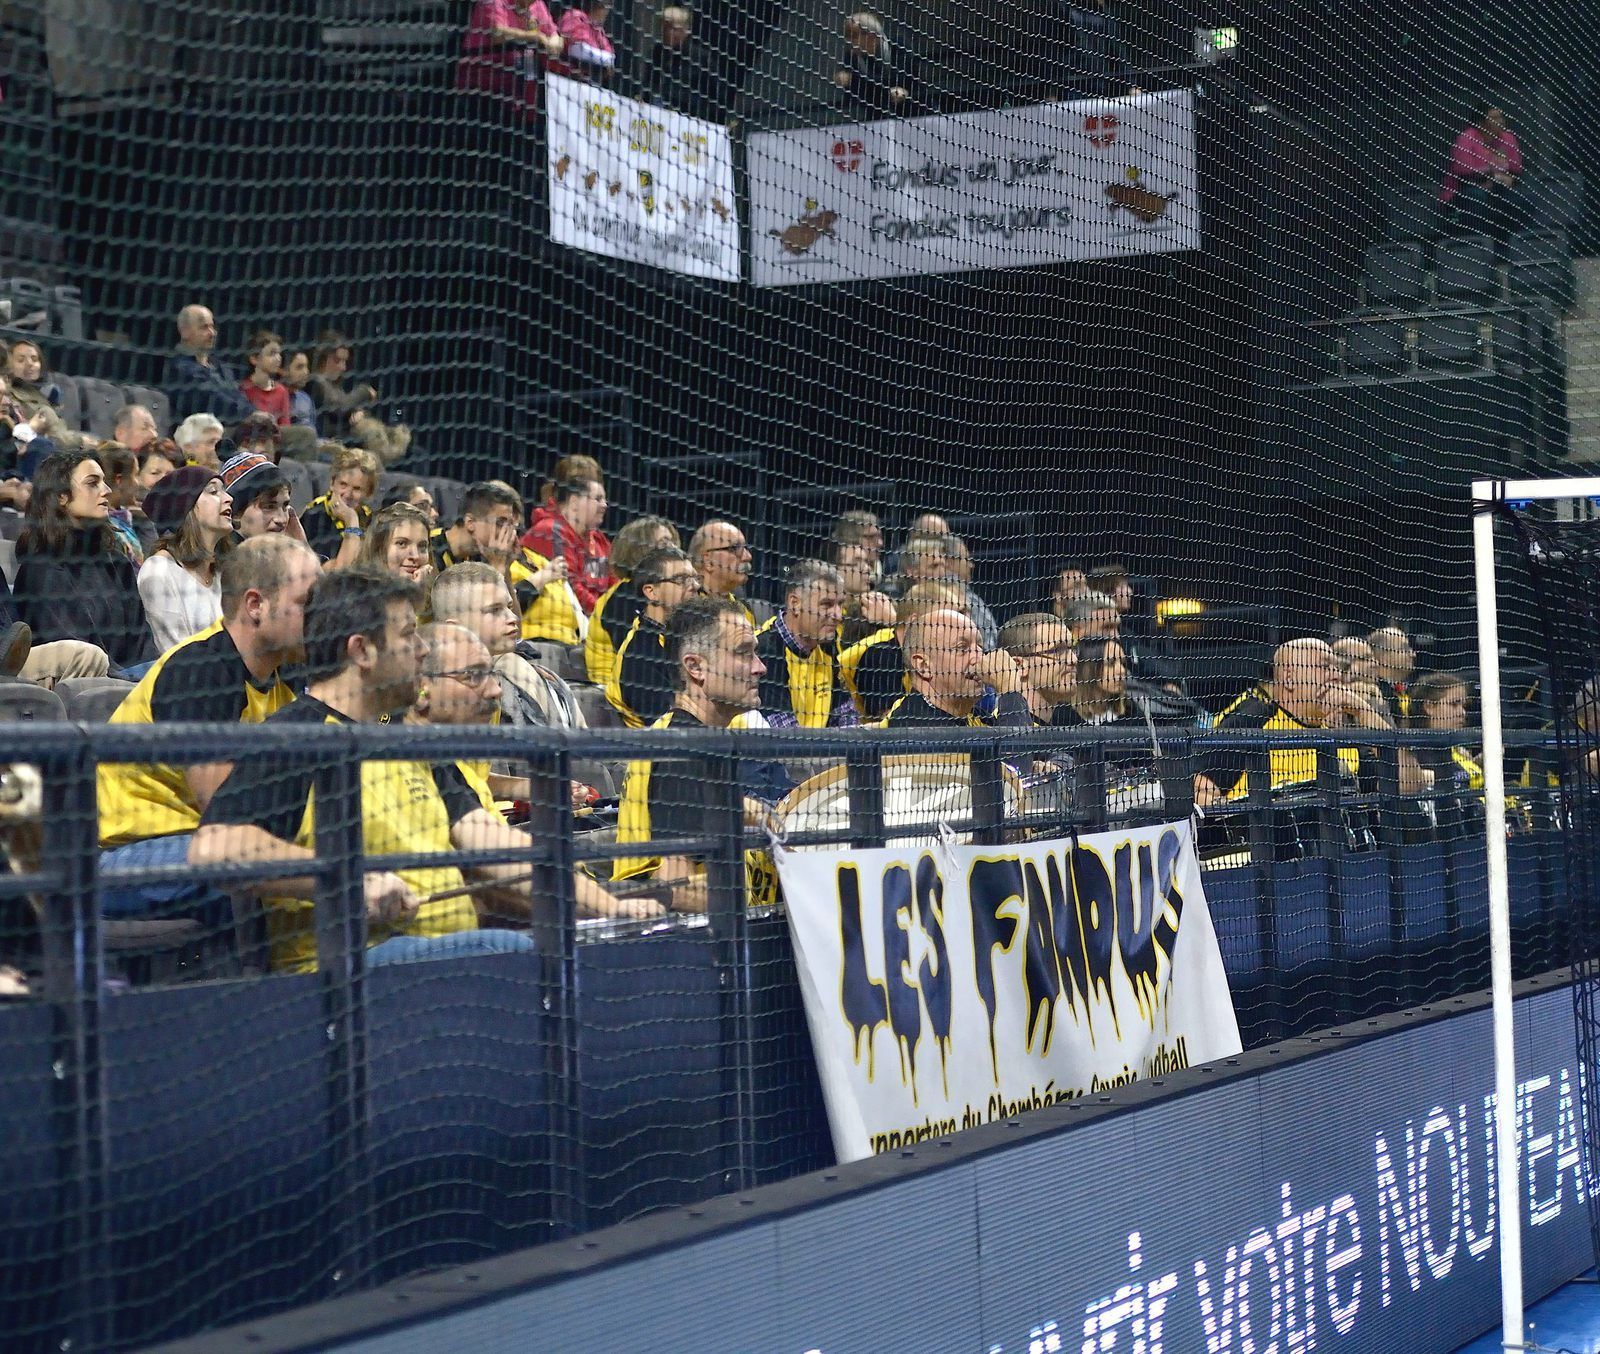 LSL CHAMBERY - IVRY : Chambéry passe la 5ème ! les photos du match